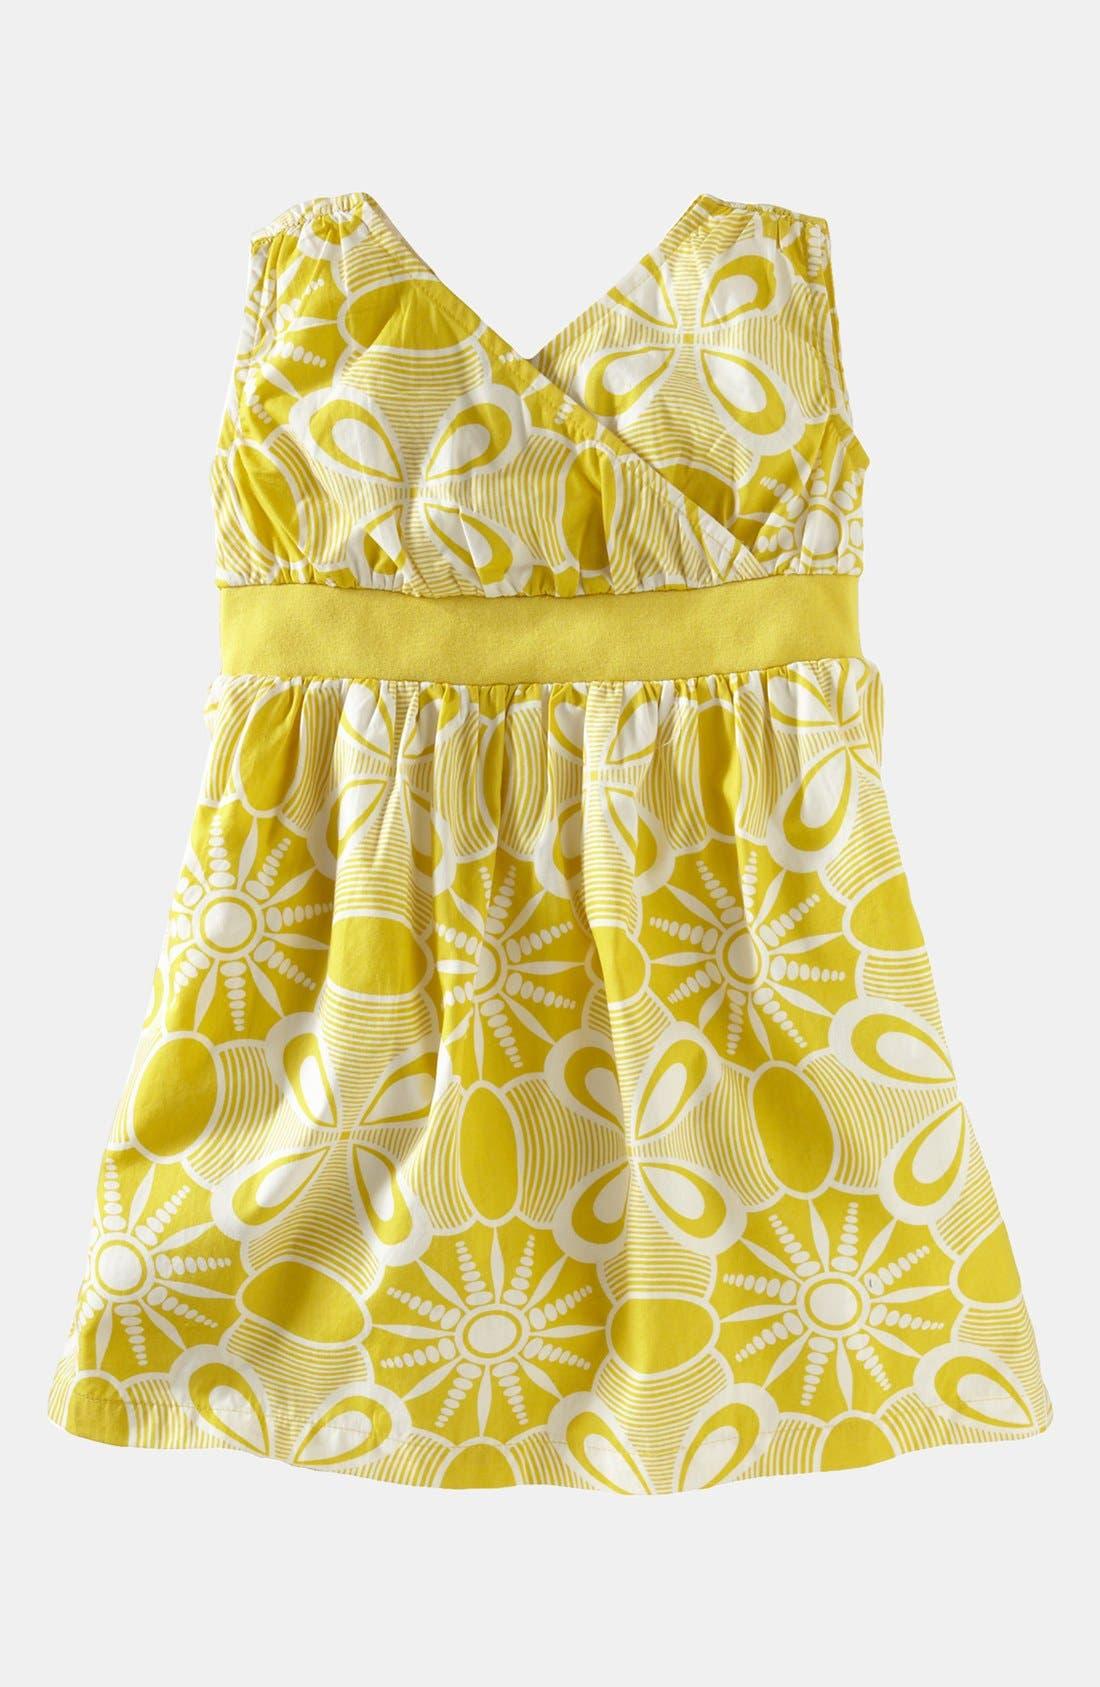 Alternate Image 1 Selected - Tea Collection 'Sea Urchin' Surplice Dress (Little Girls & Big Girls)